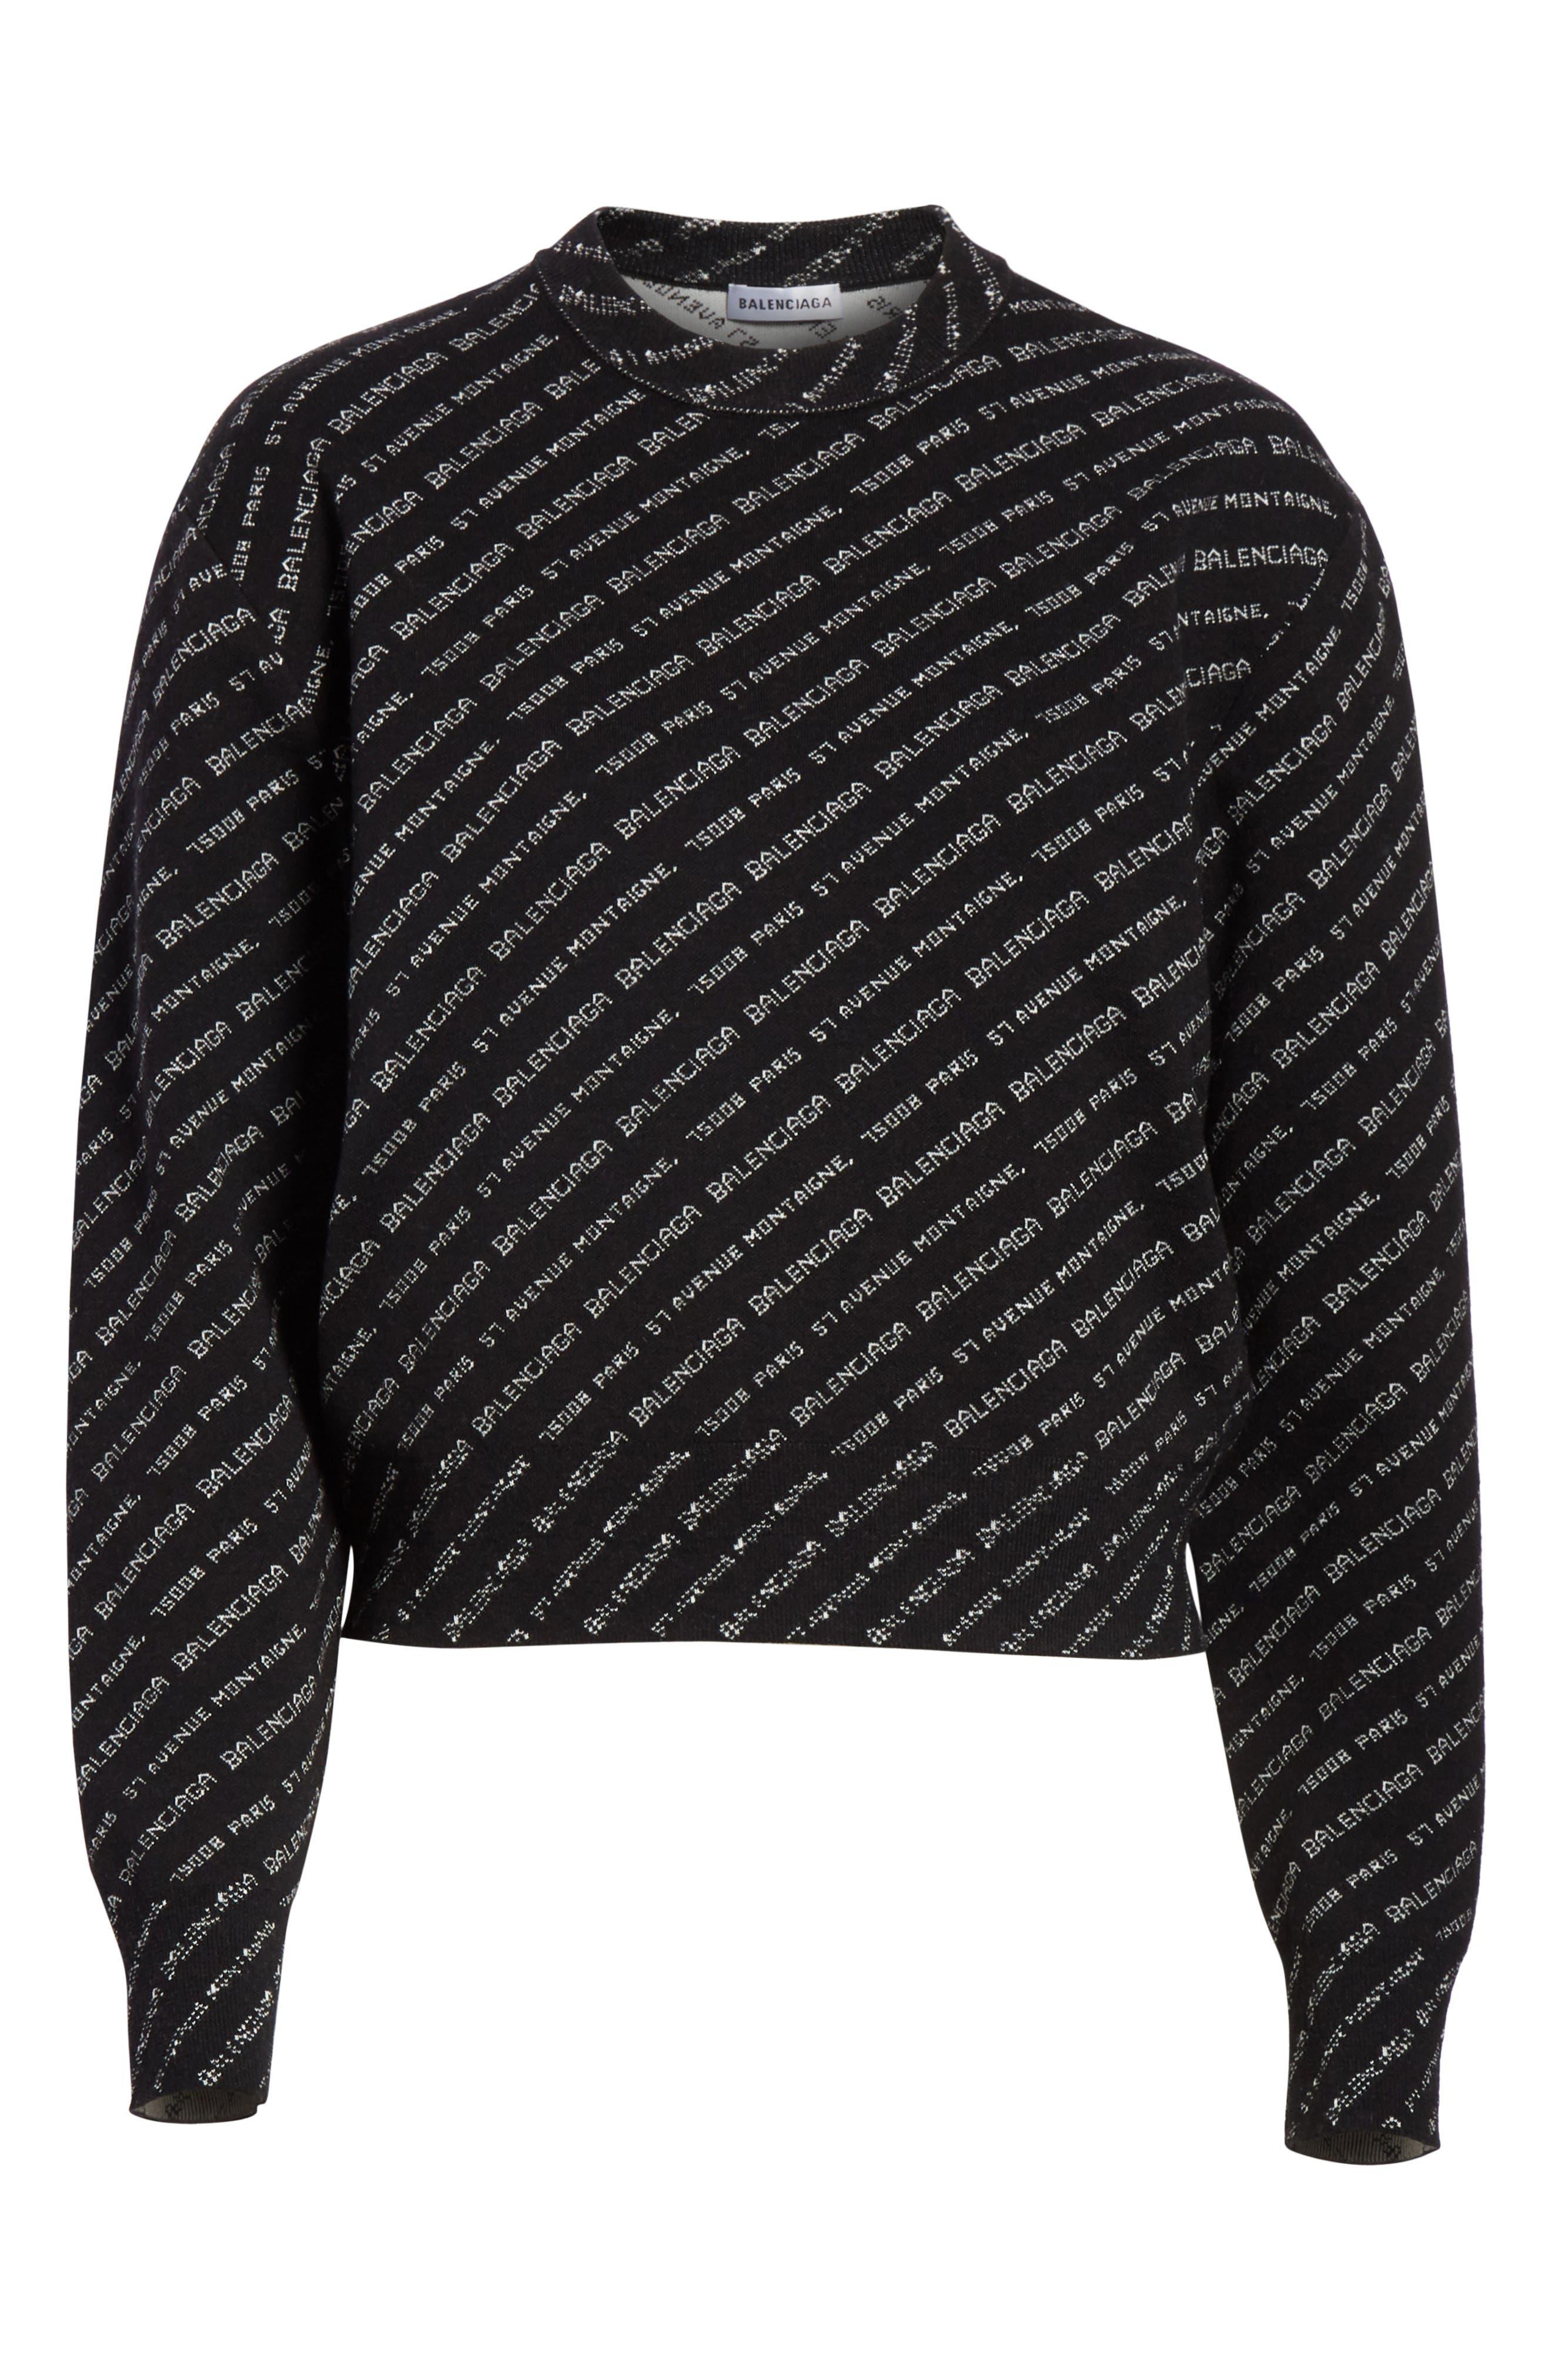 BALENCIAGA,                             Logo Knit Sweater,                             Alternate thumbnail 6, color,                             001